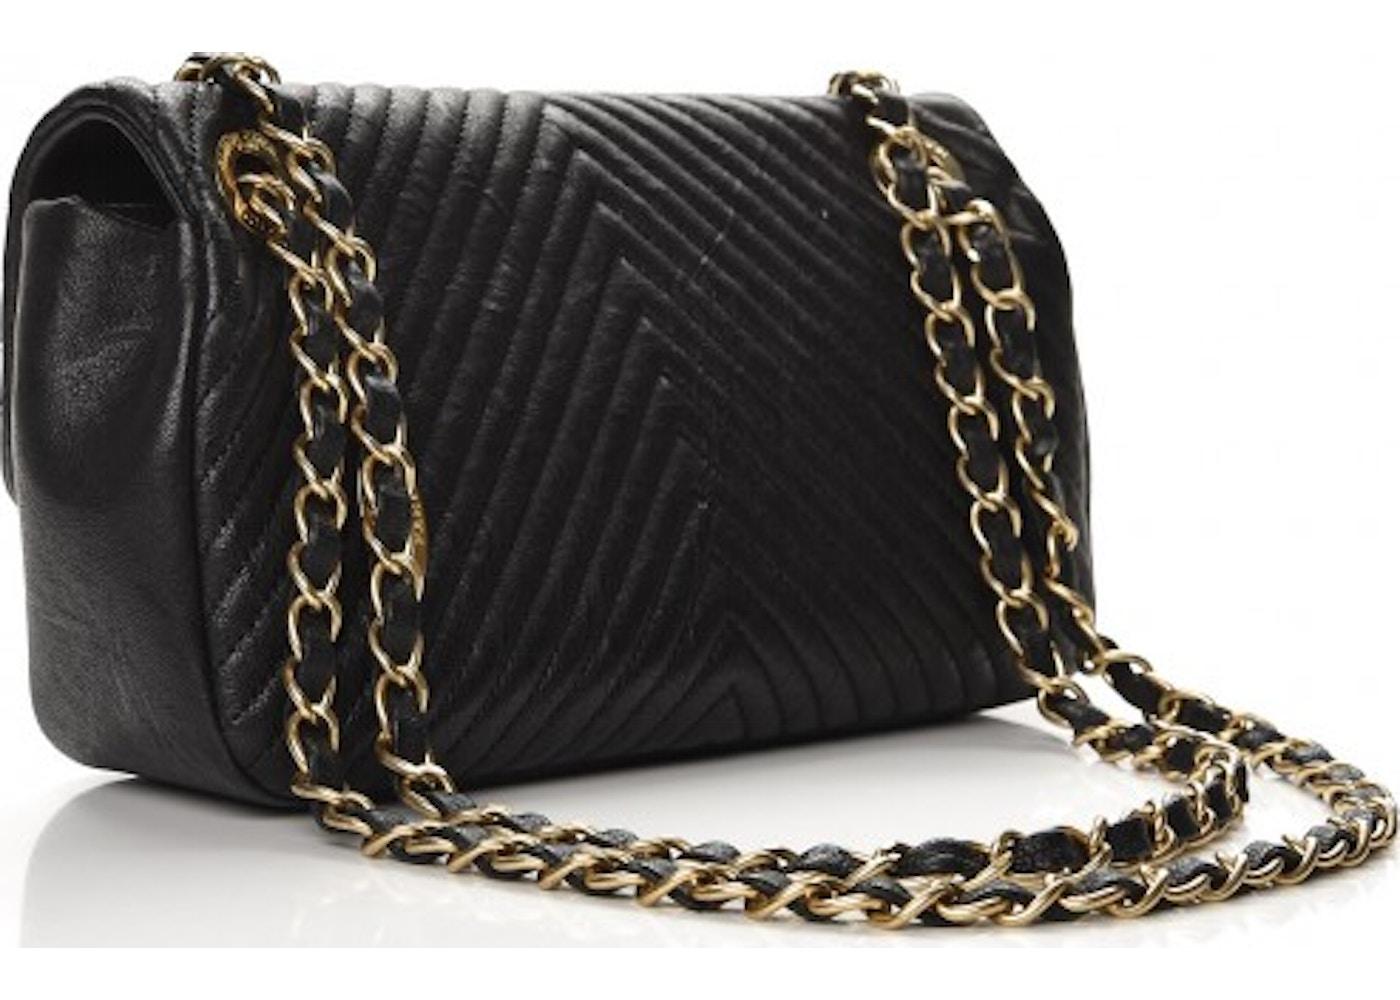 766c238f9b08e2 Chanel Surpique Flap Quilted Chevron Small Black